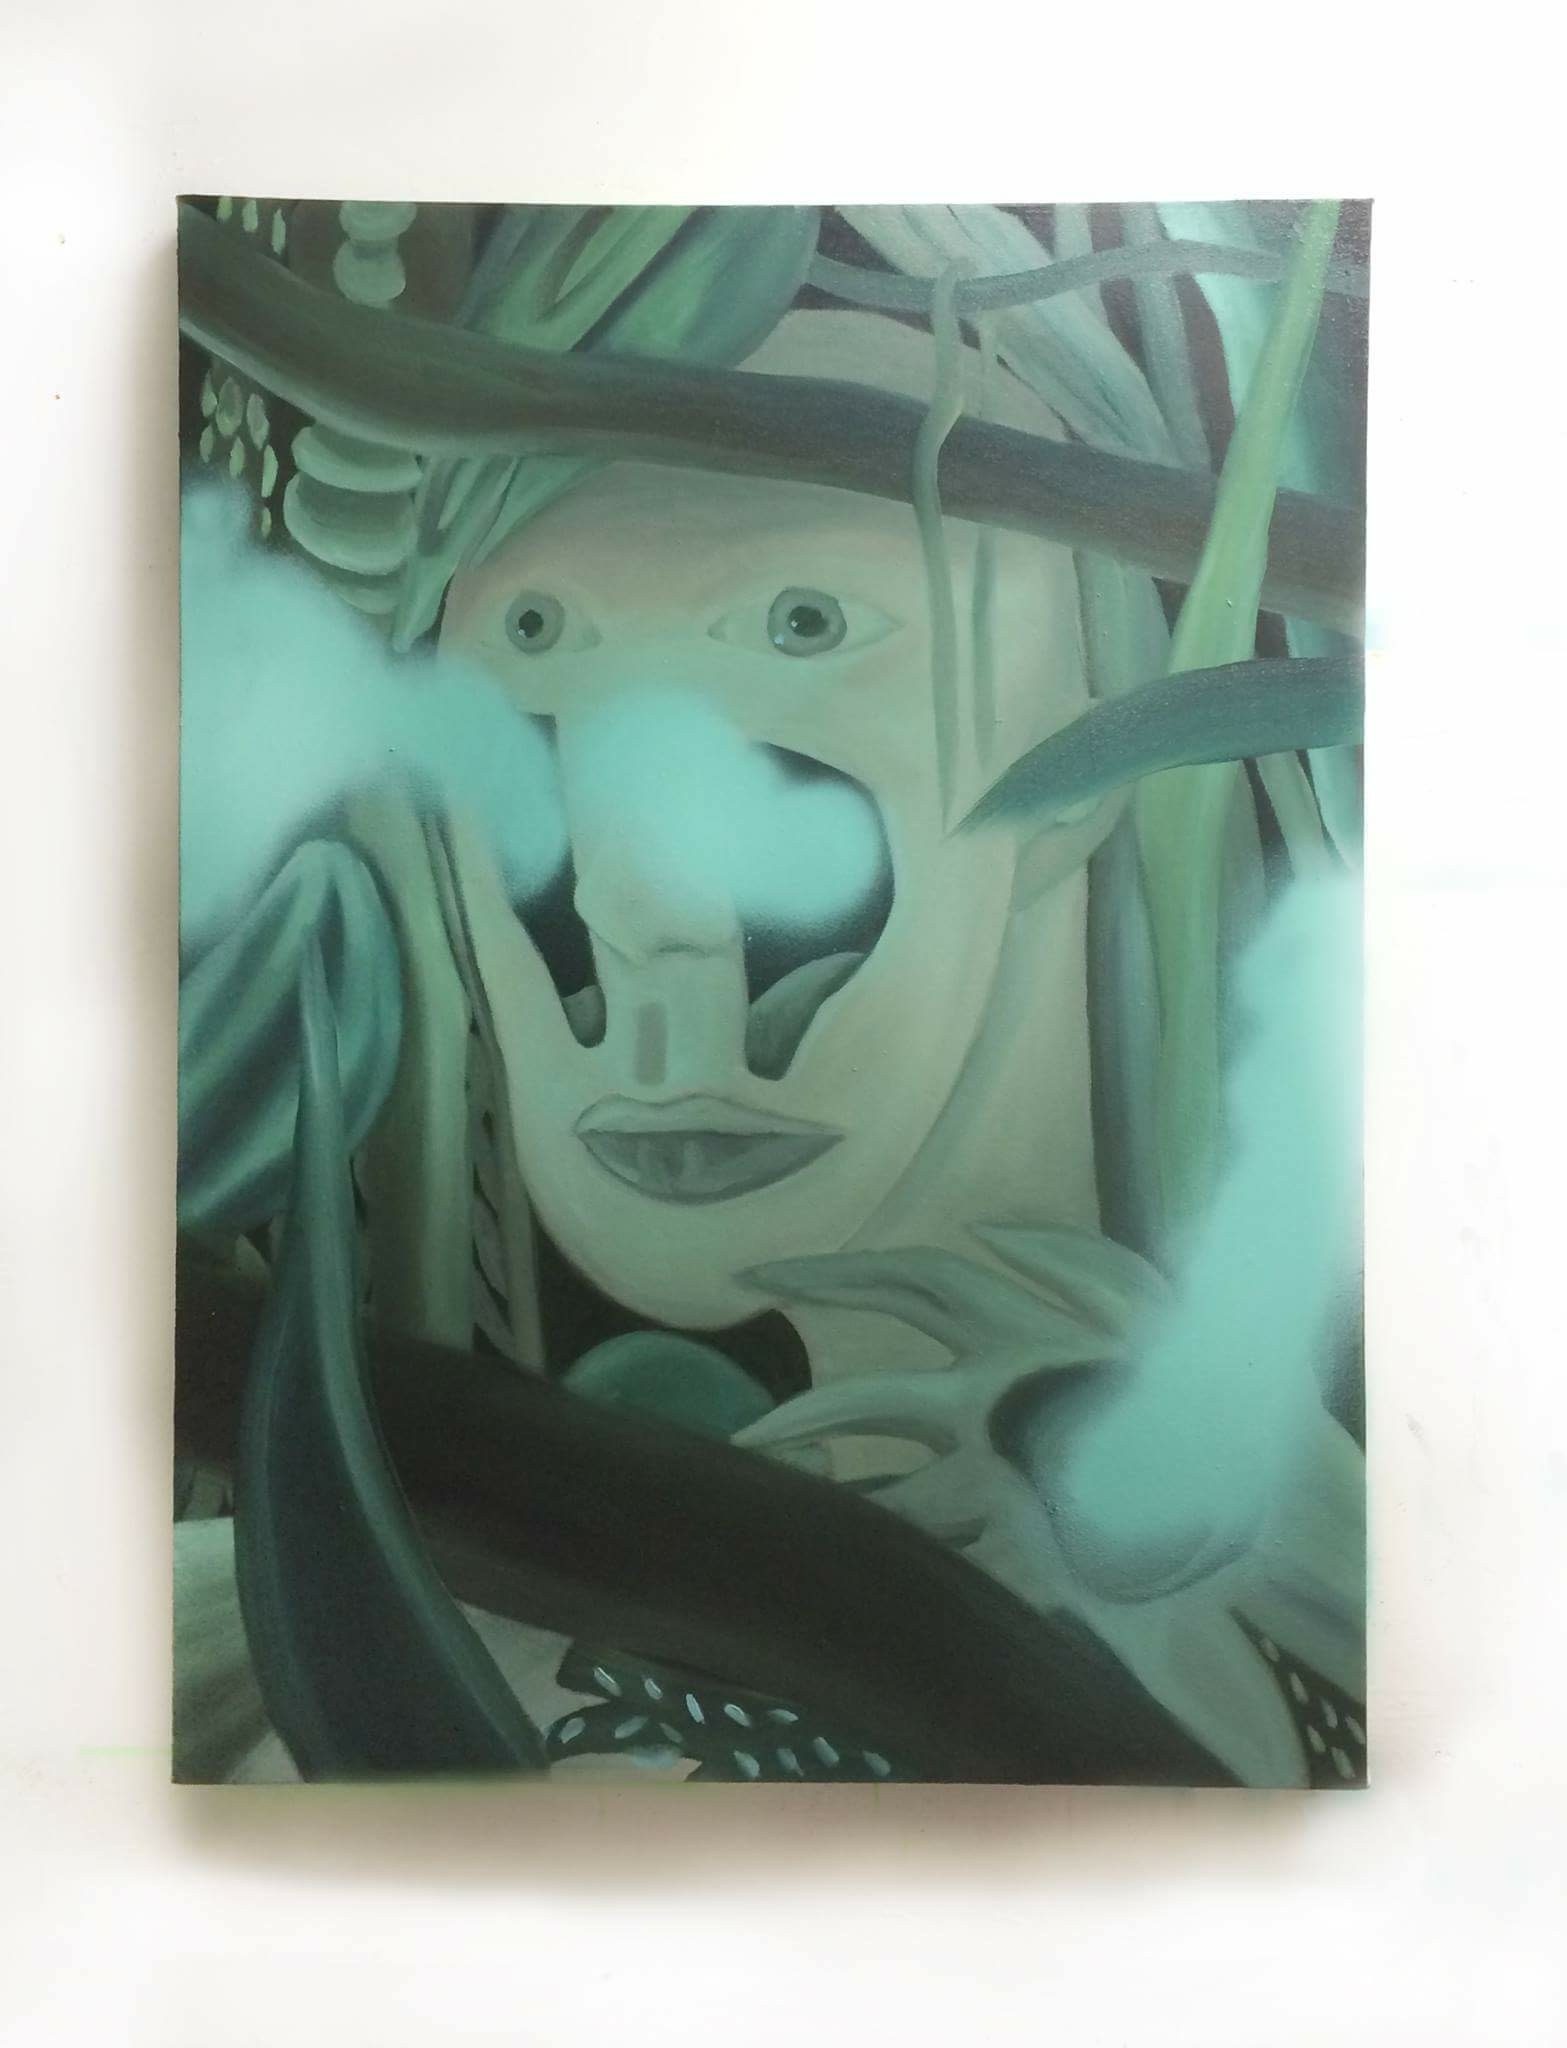 Claire Scherzinger,Uncorking,2016,oil and spray paint on canvas,40 x 30 in.